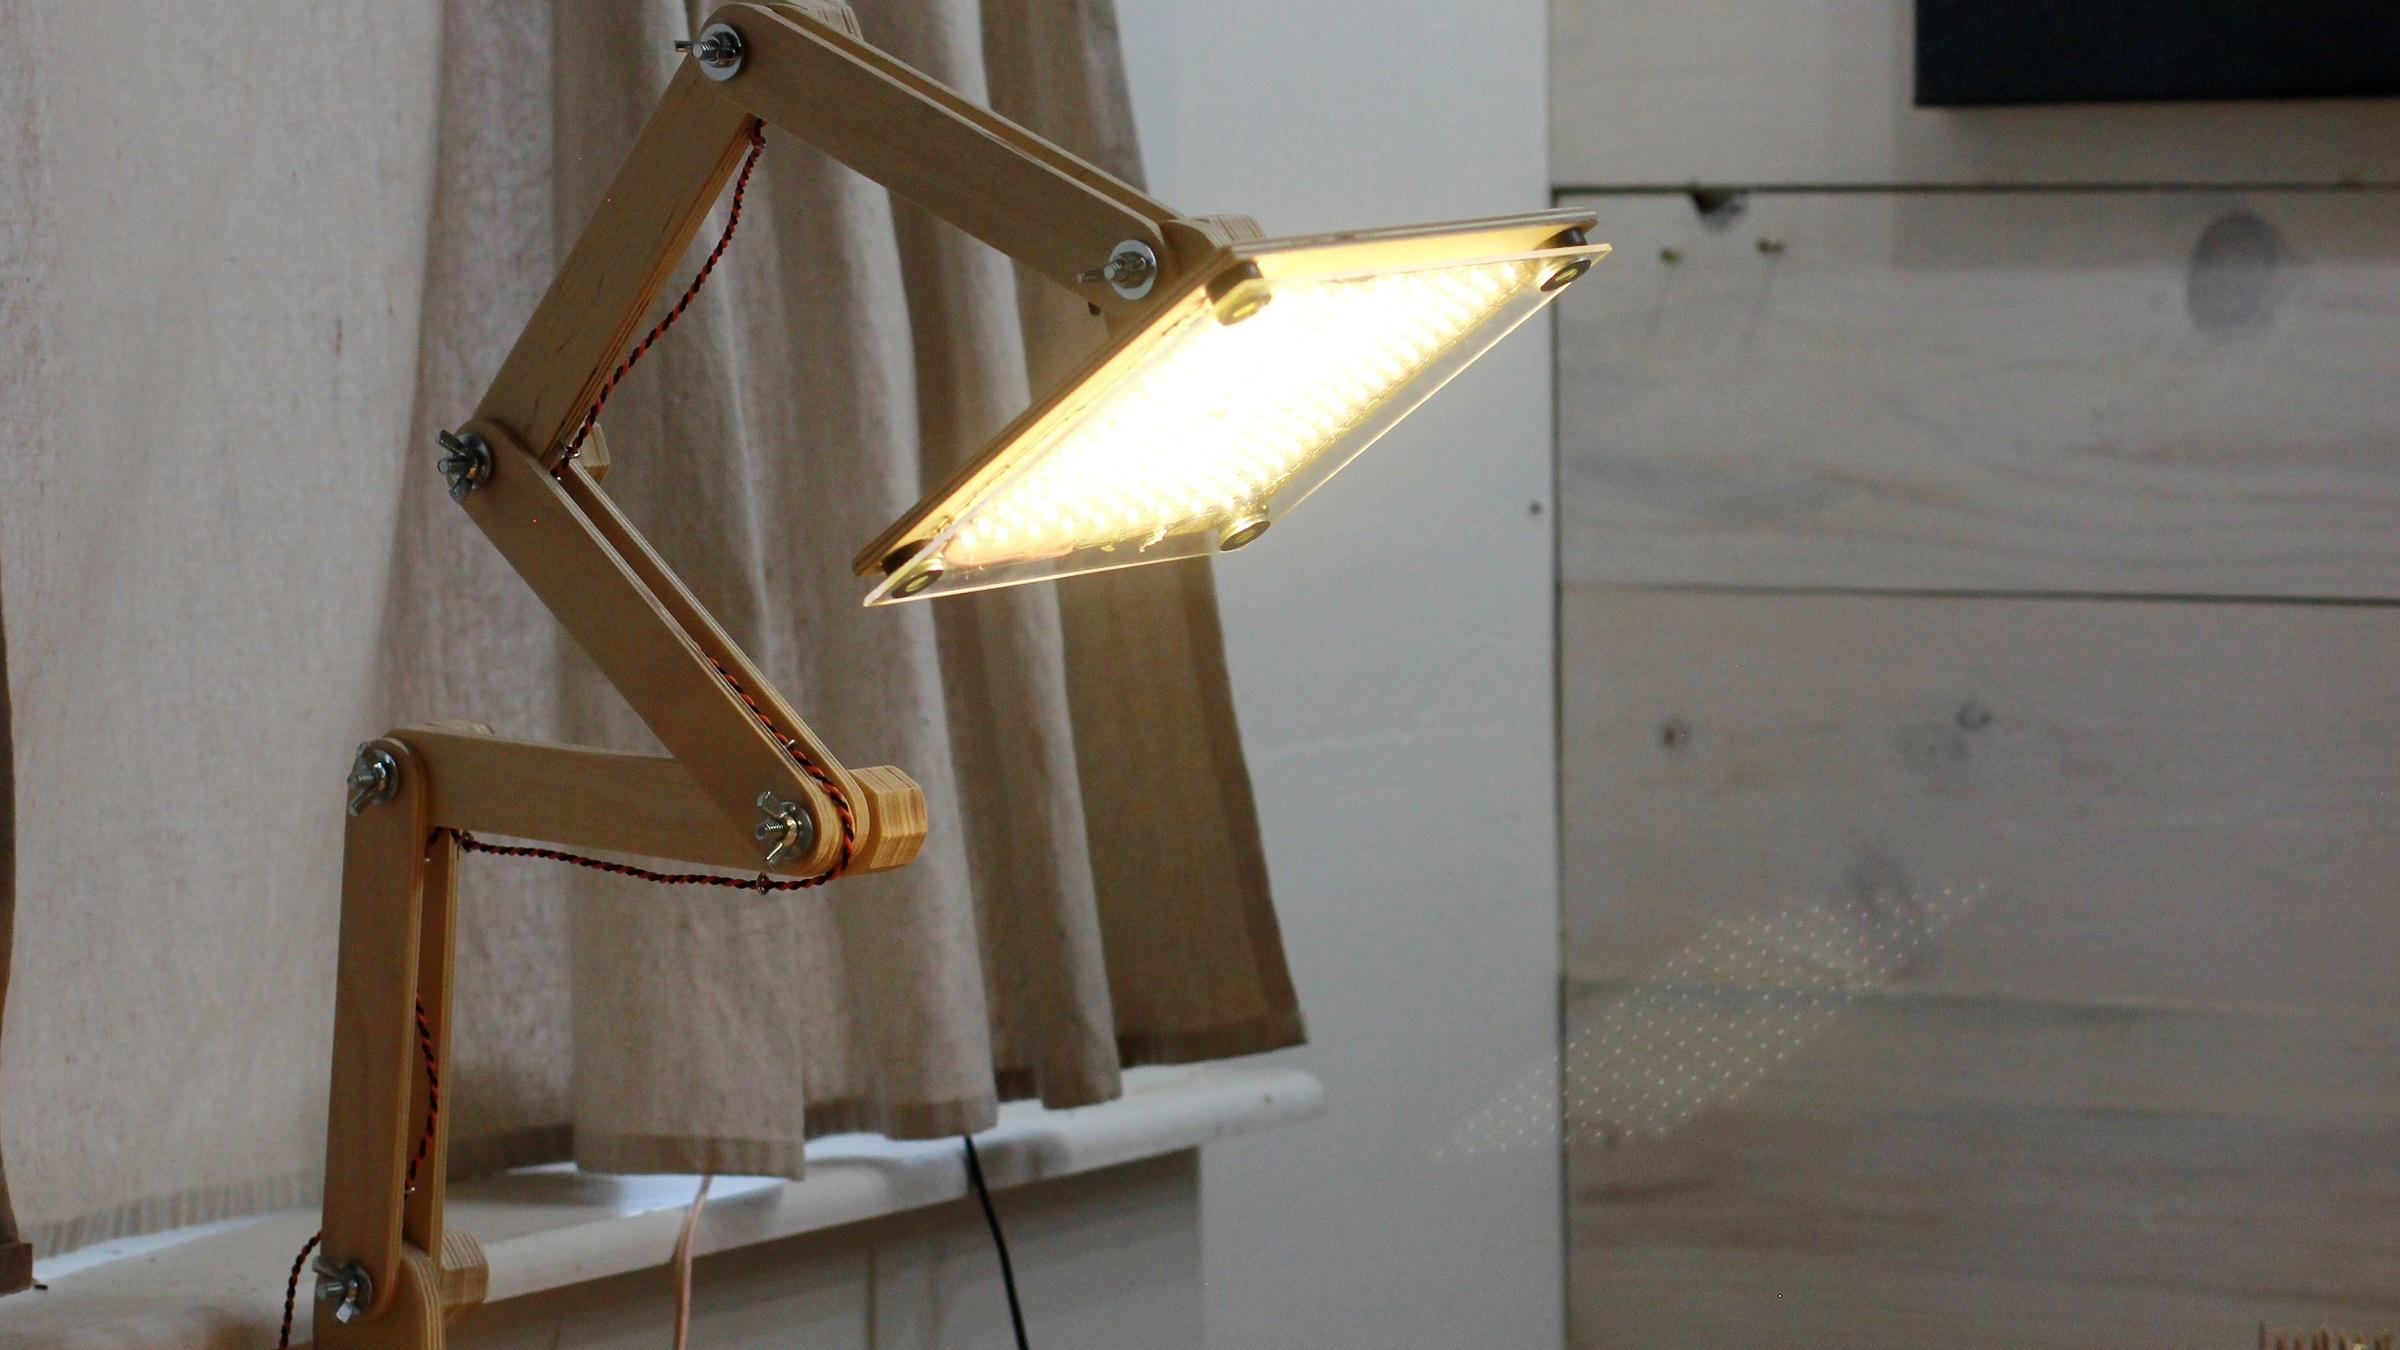 Darbin Orvar: A Minimalist Articulated LED Lamp